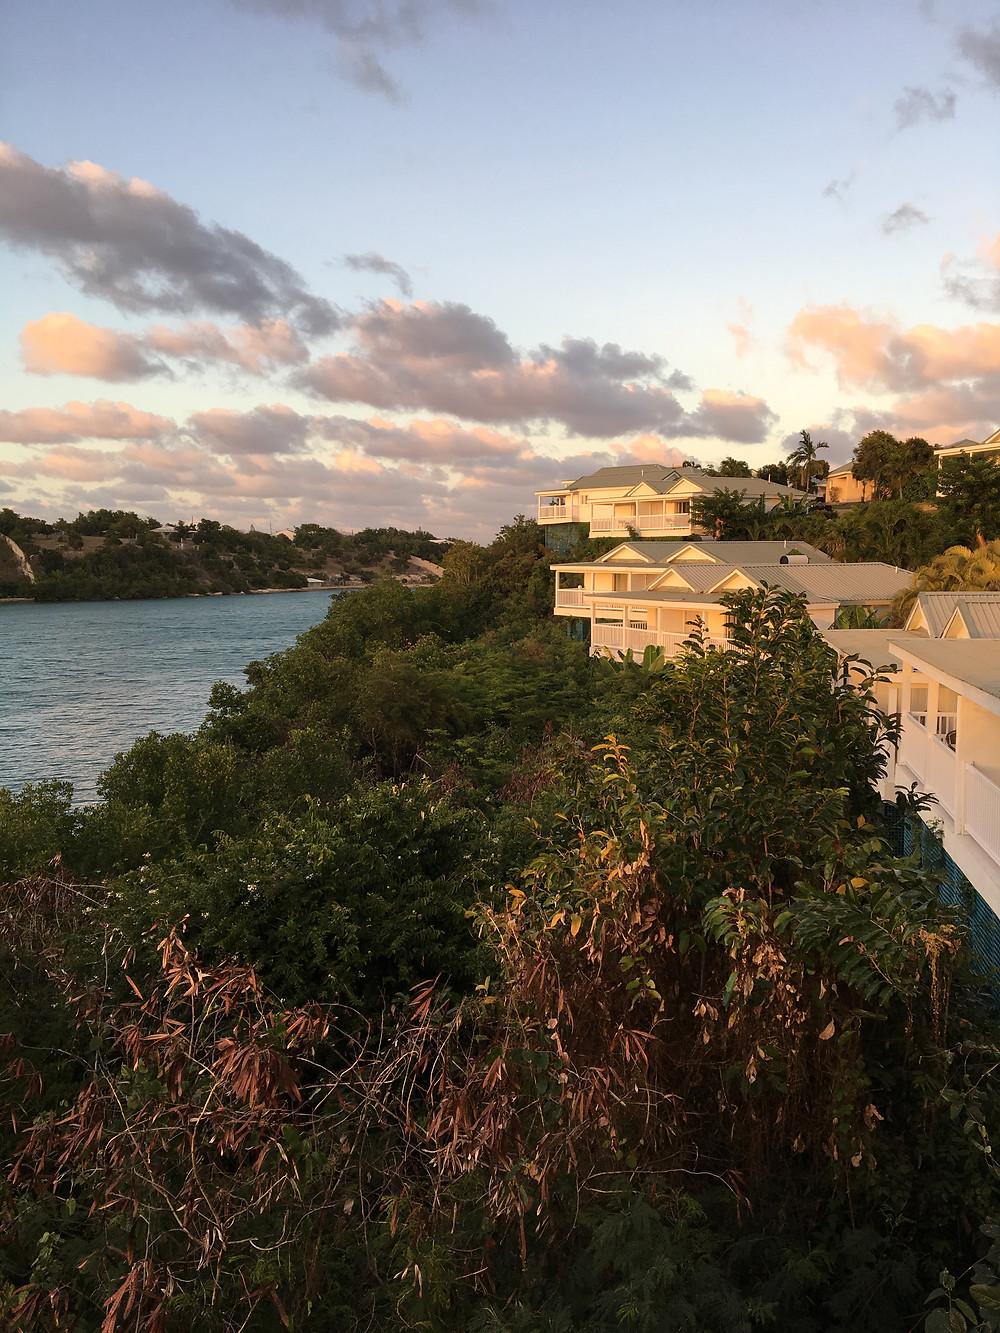 The Verandah Resort and Spa, Antigua, Voyages Isana